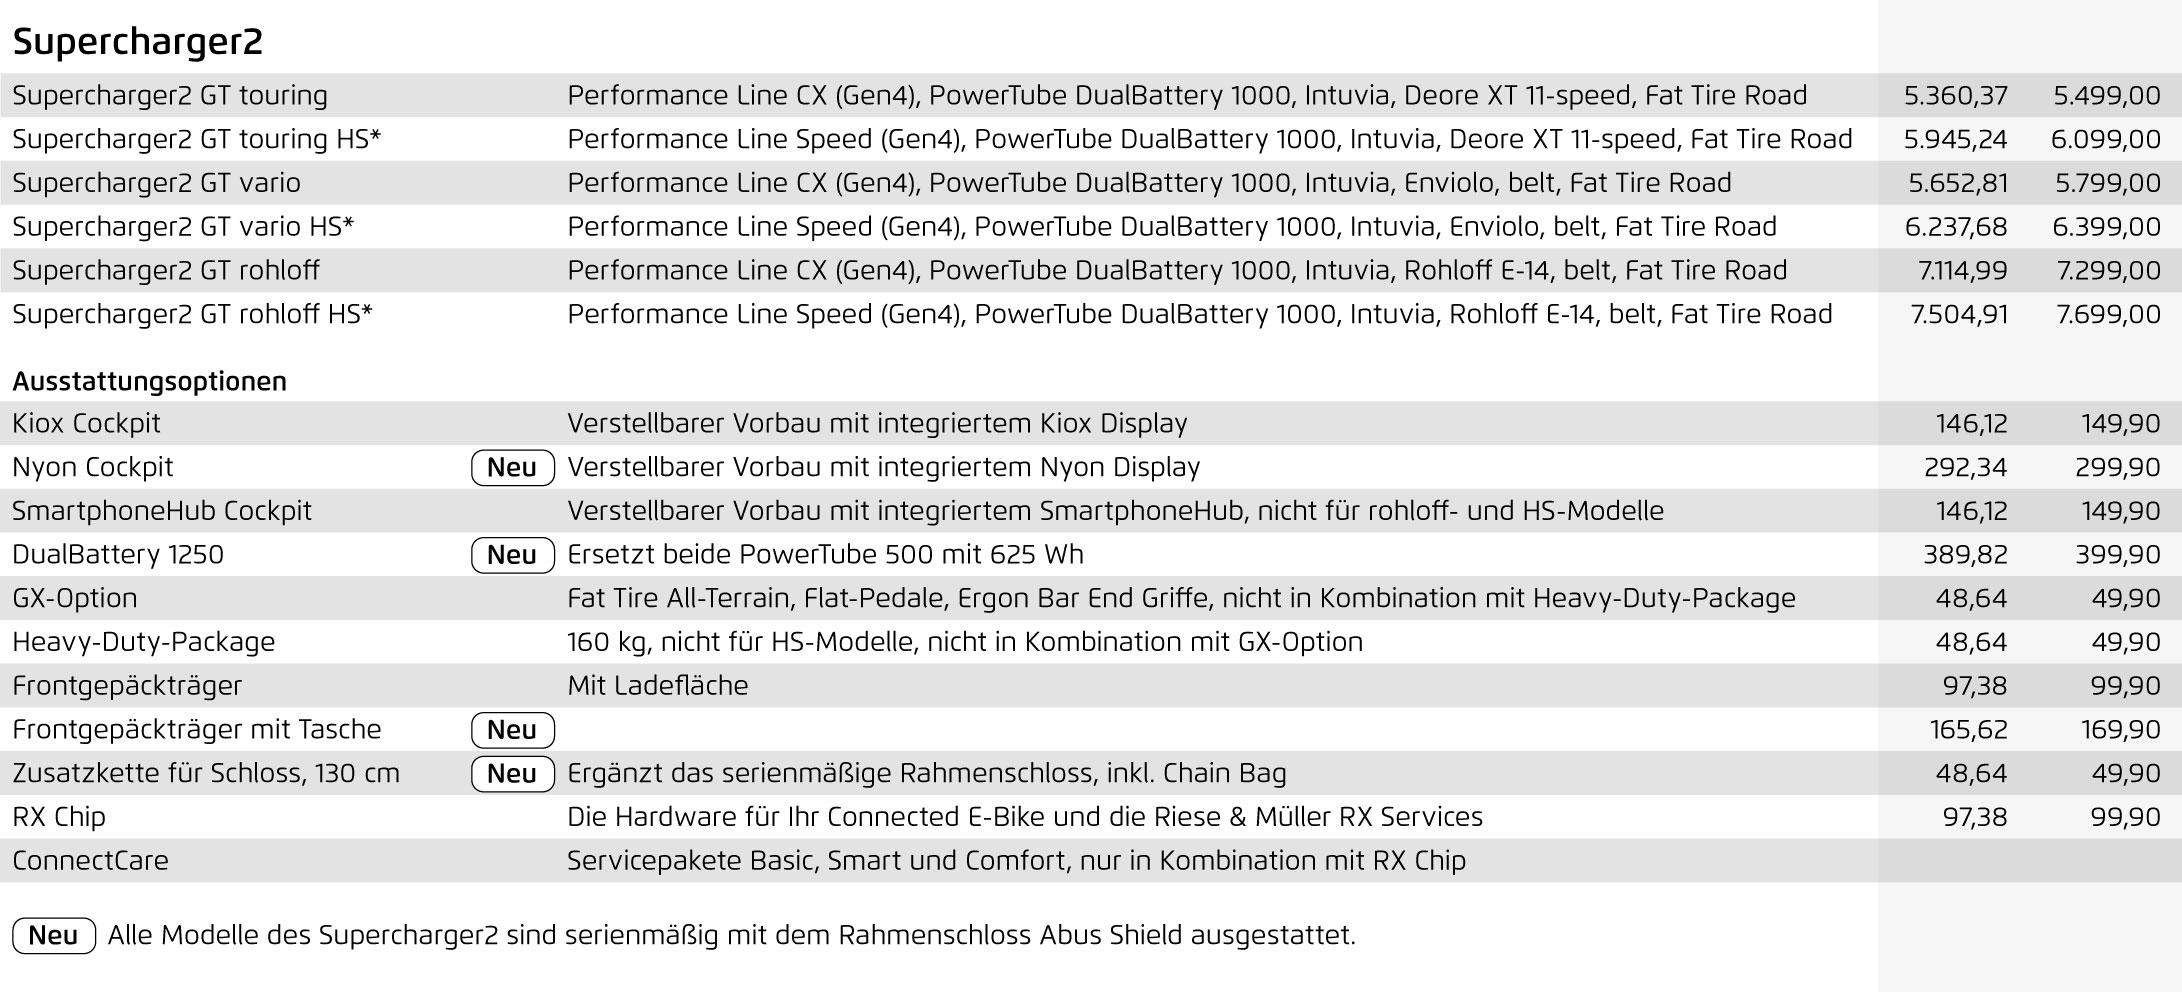 Supercharger2 Preisliste